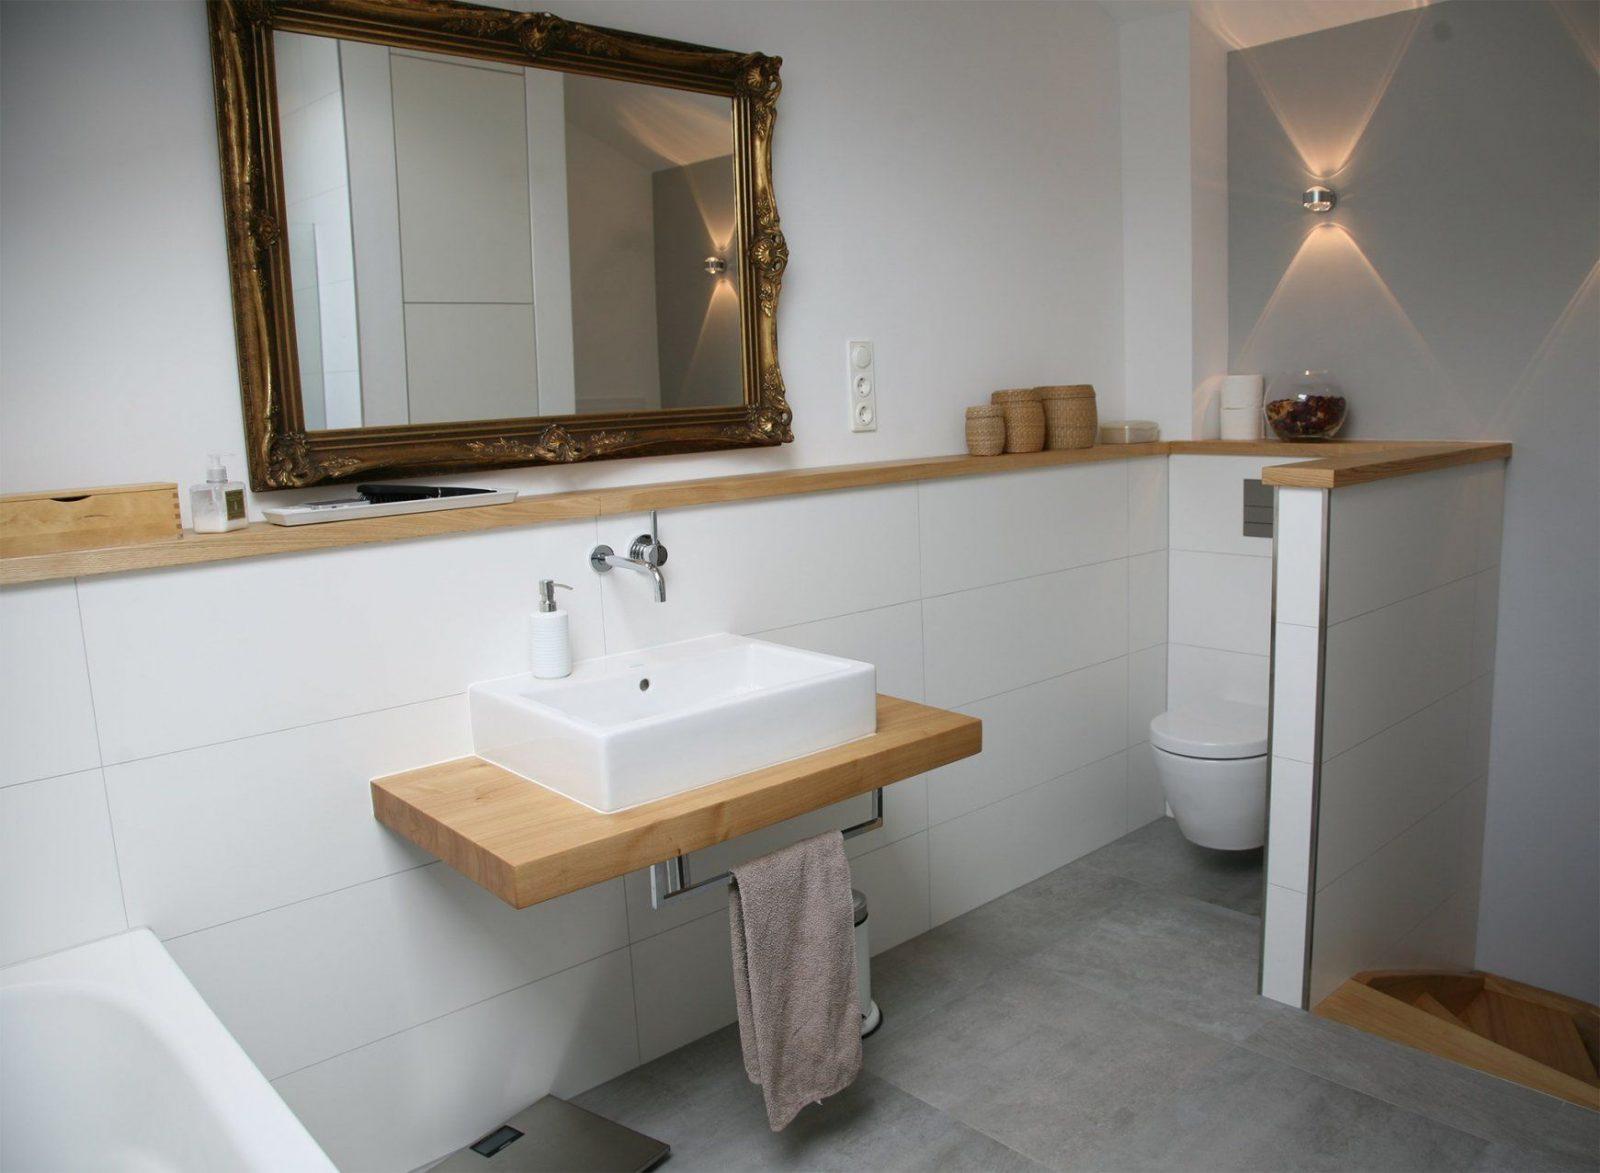 Waschtisch Selber Bauen Bauplatten  Haus Design Ideen